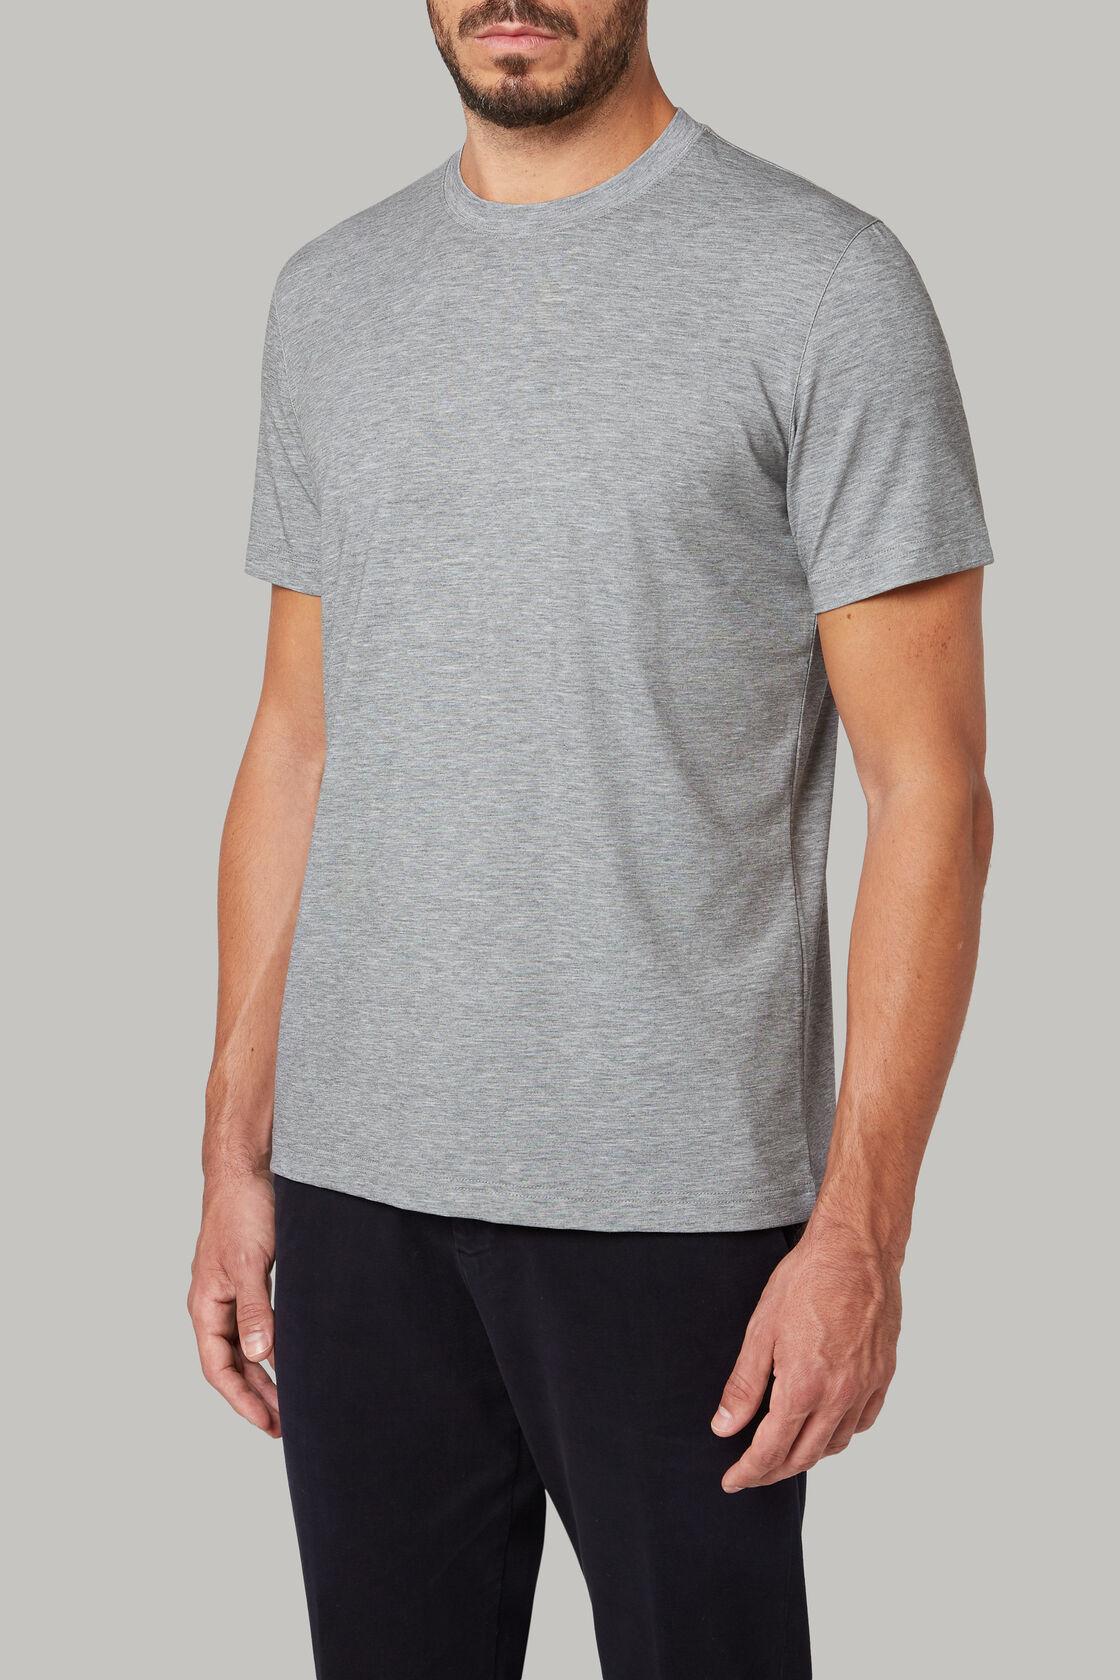 T-shirt aus baumwolljersey und nylon-tencel, Dunkelgrau, hi-res